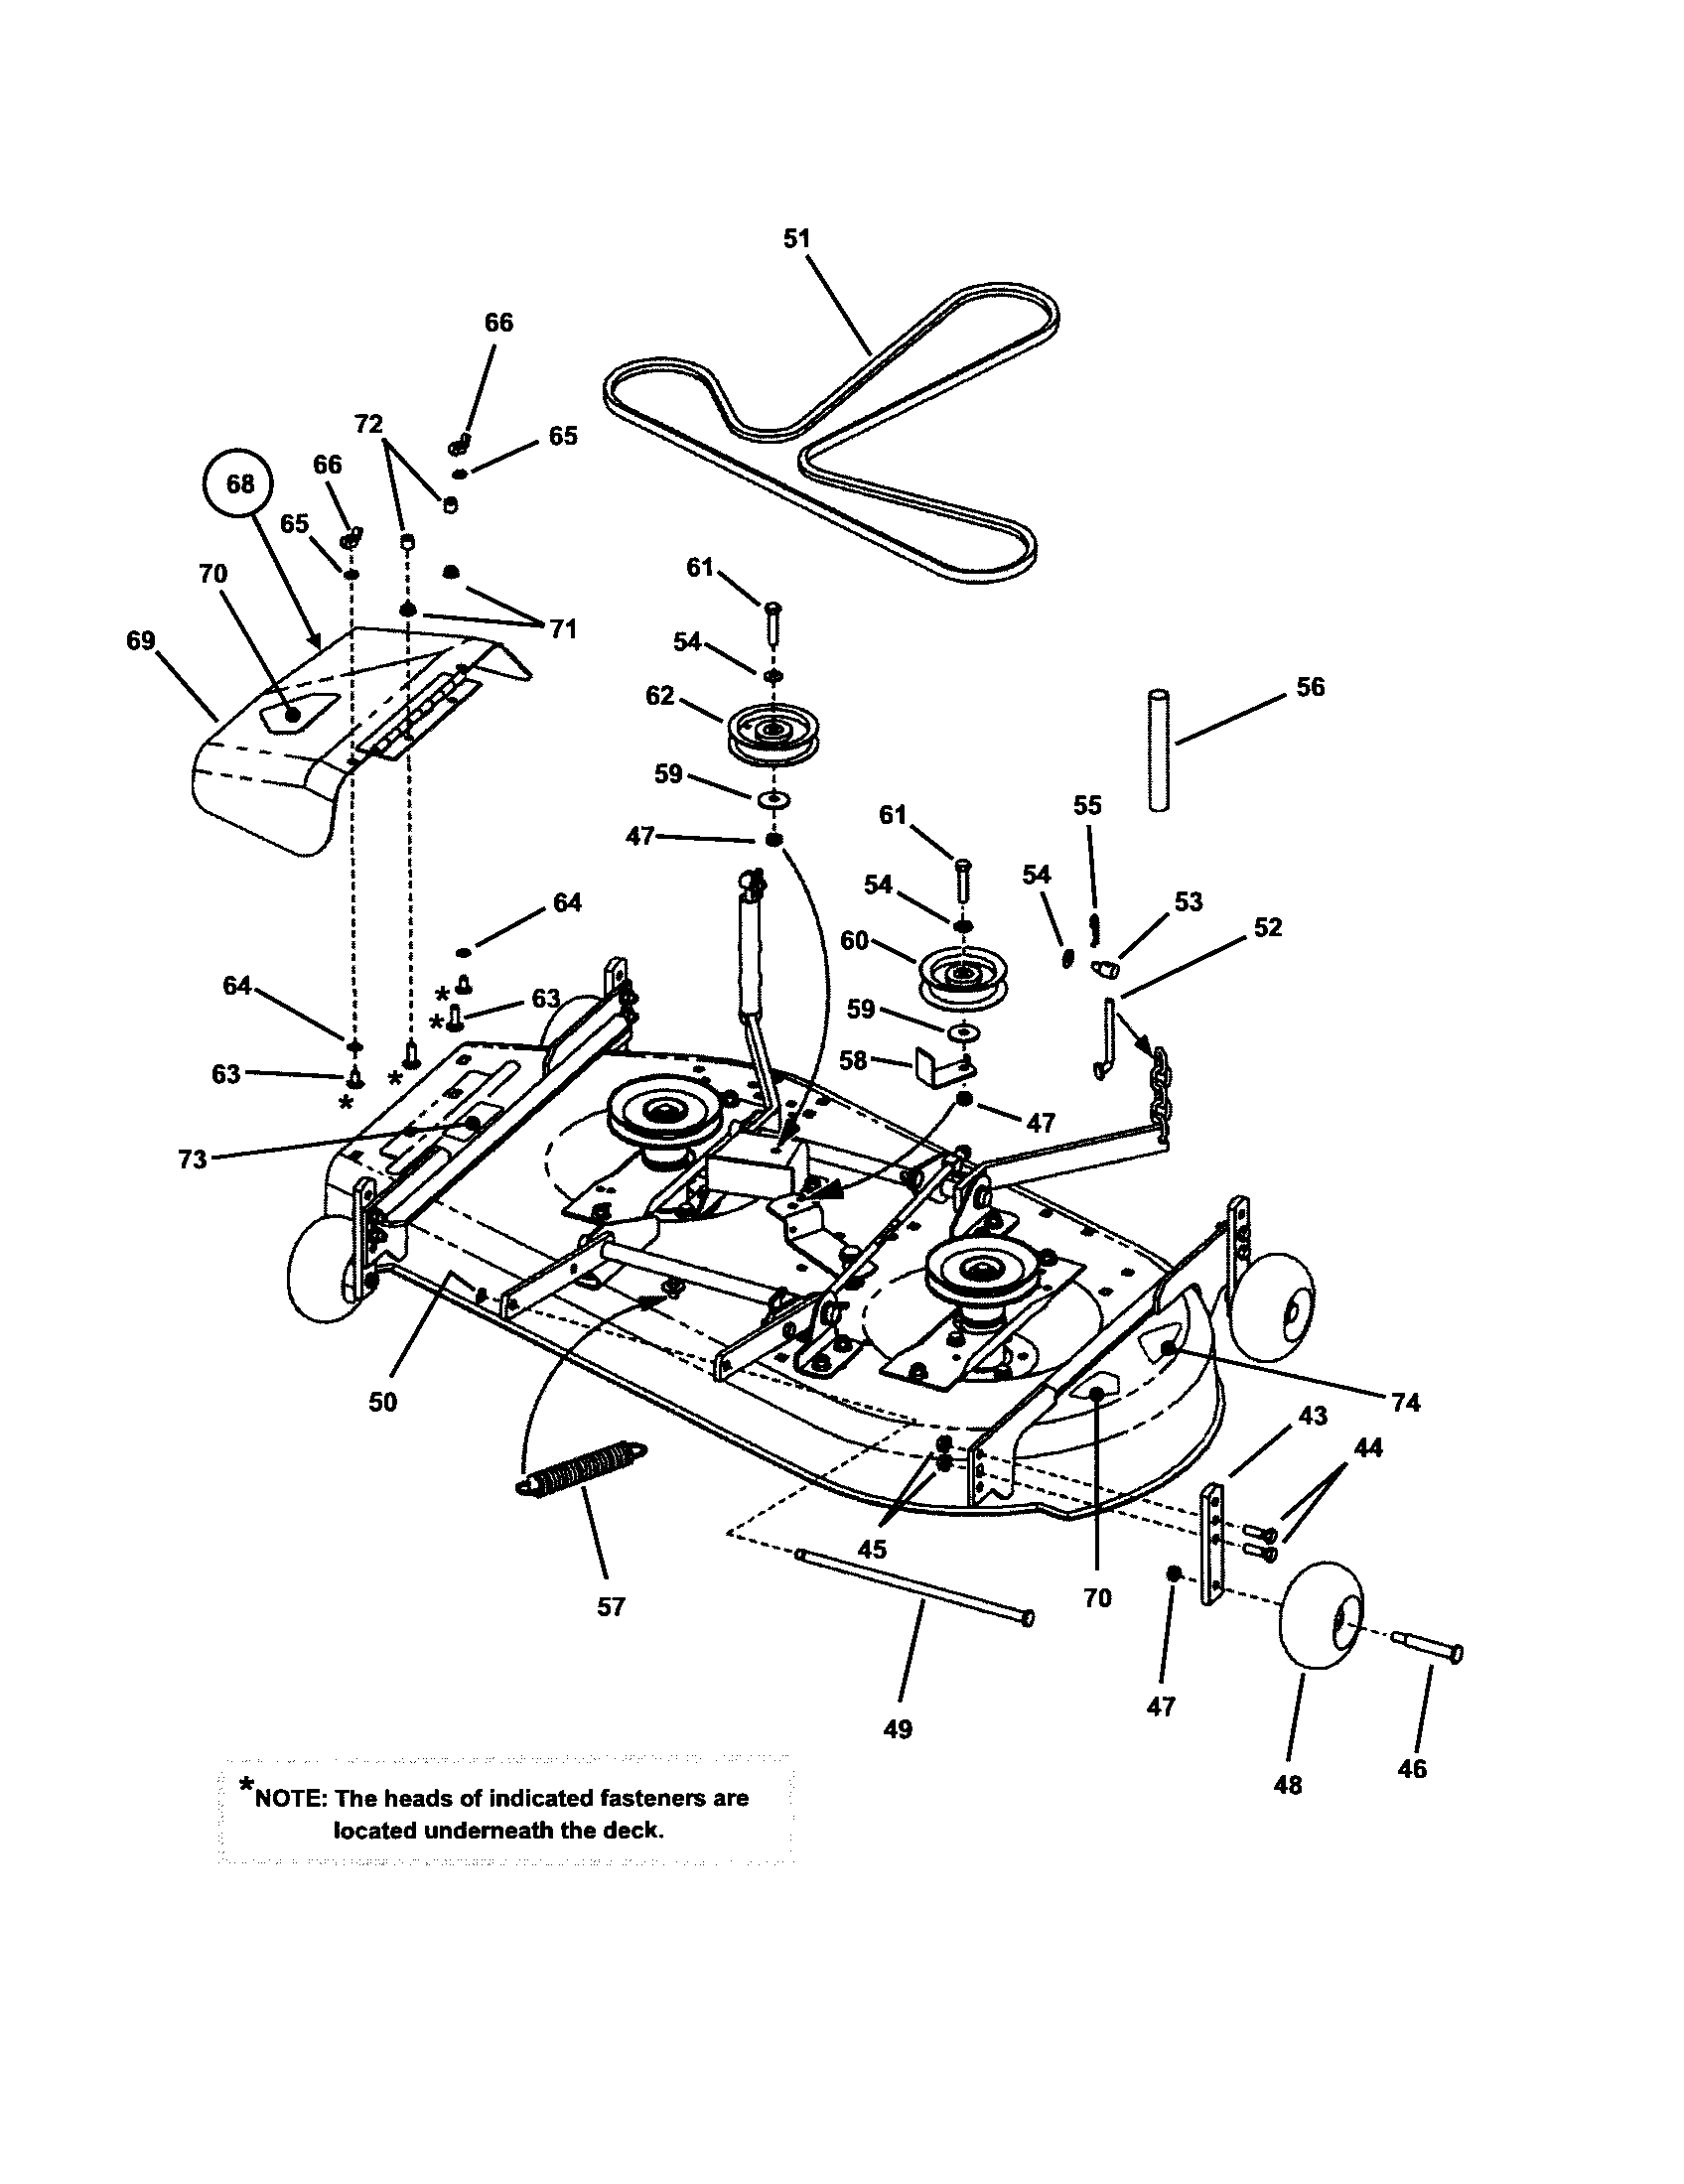 snapper rear engine riding mower model 301223bve